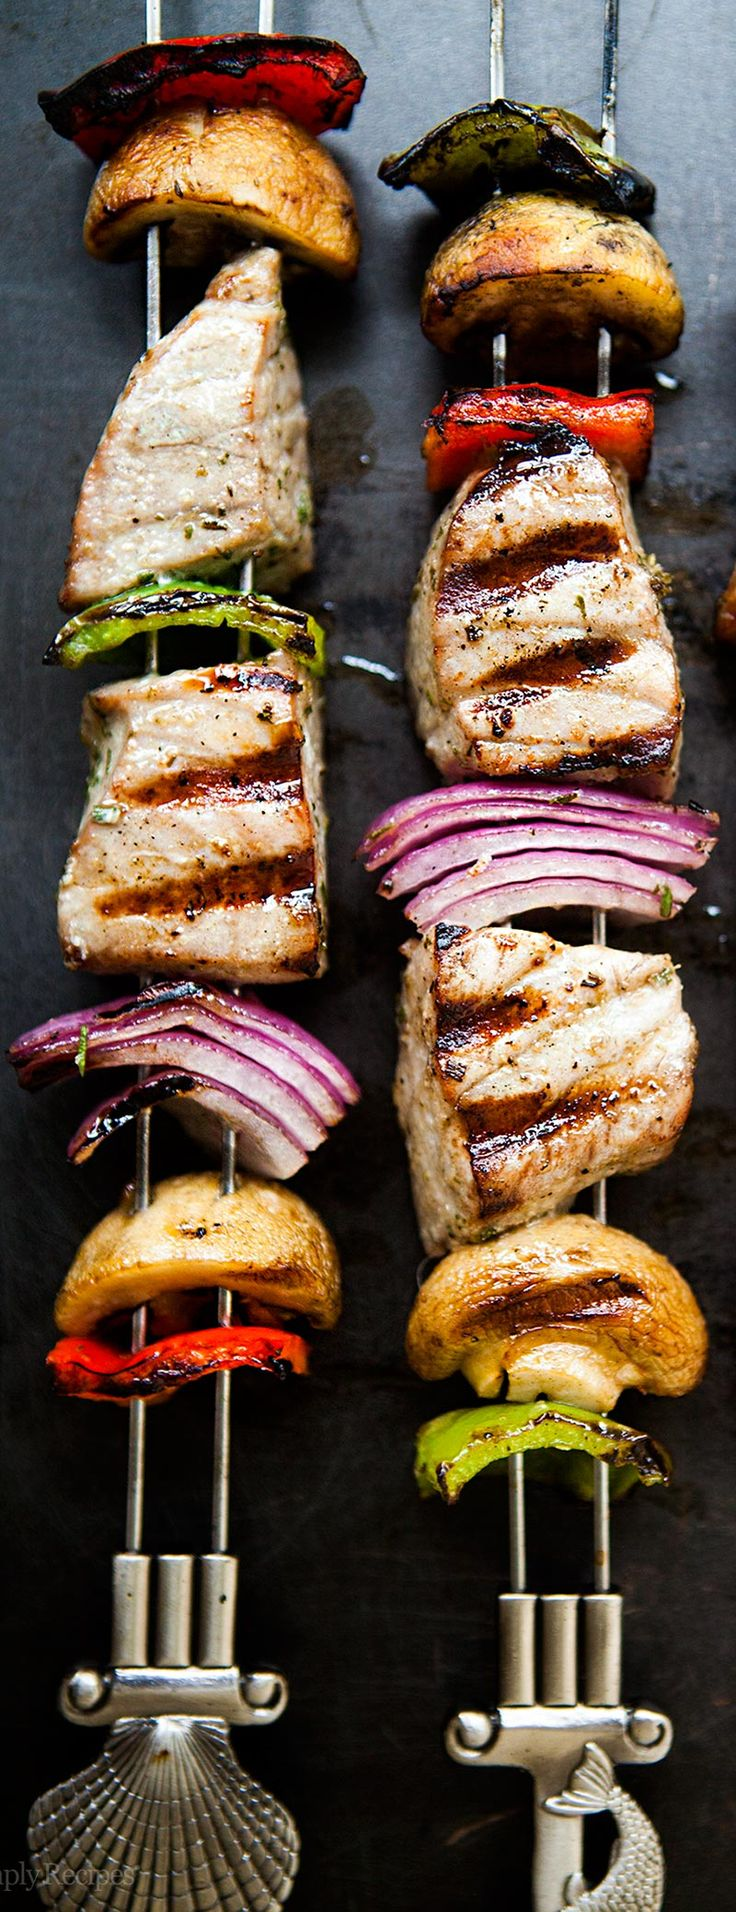 Tuna, Grilled tuna and Kebabs on Pinterest